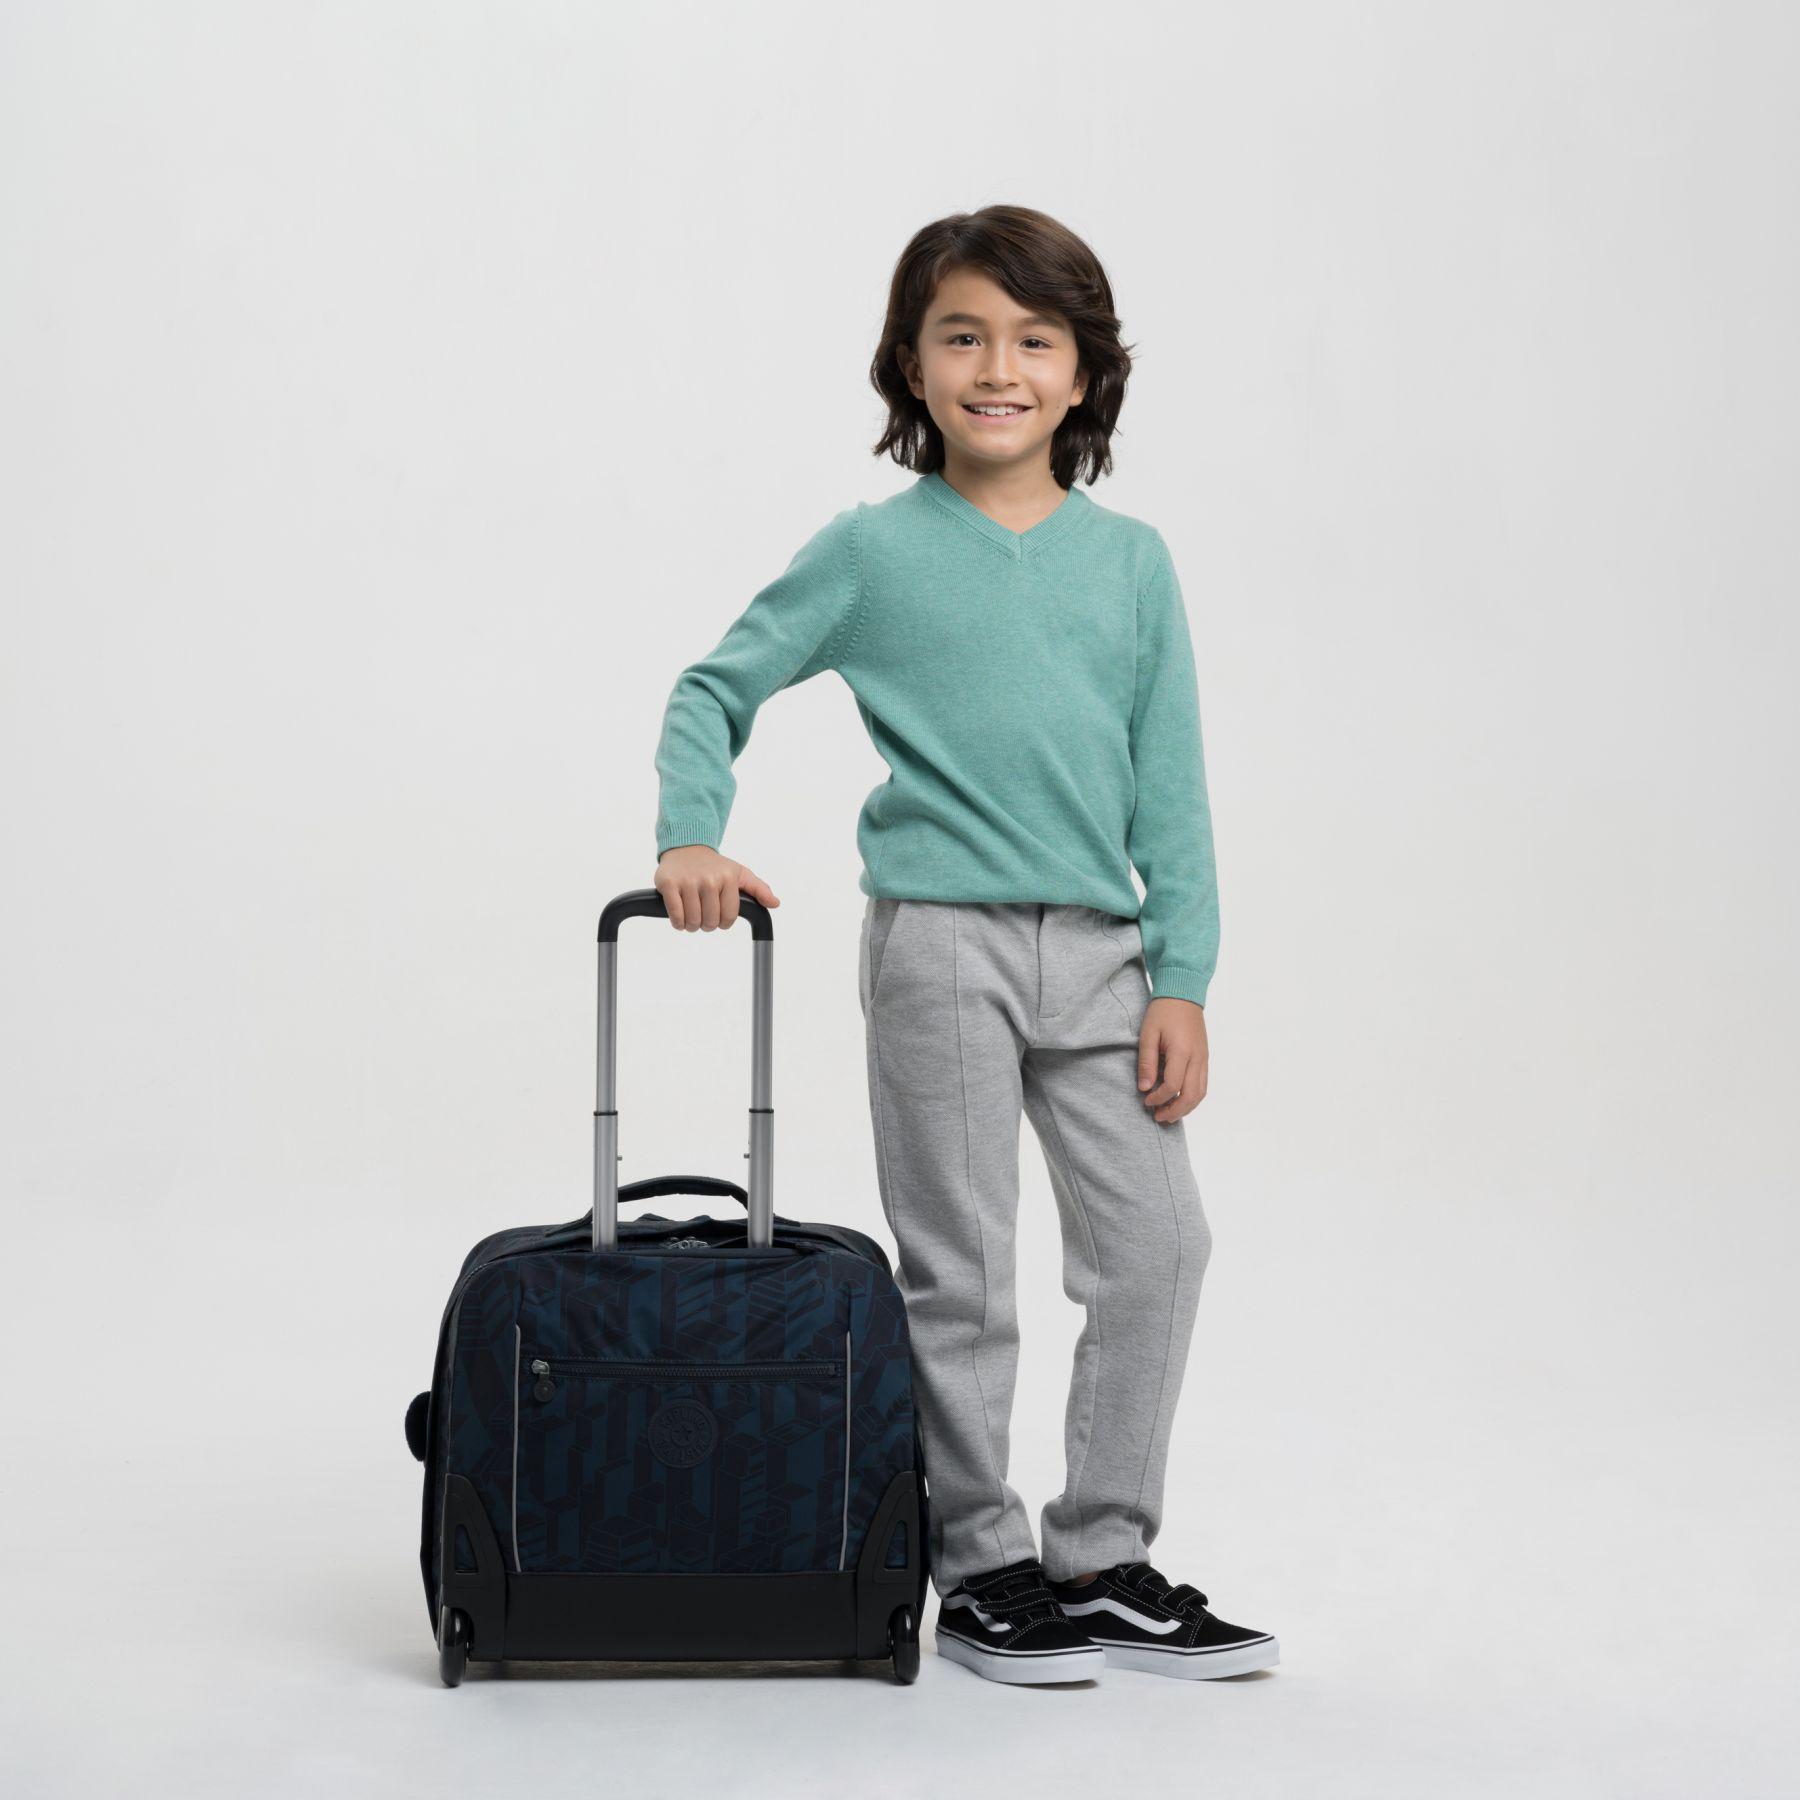 GIORNO SCHOOL BAGS by Kipling